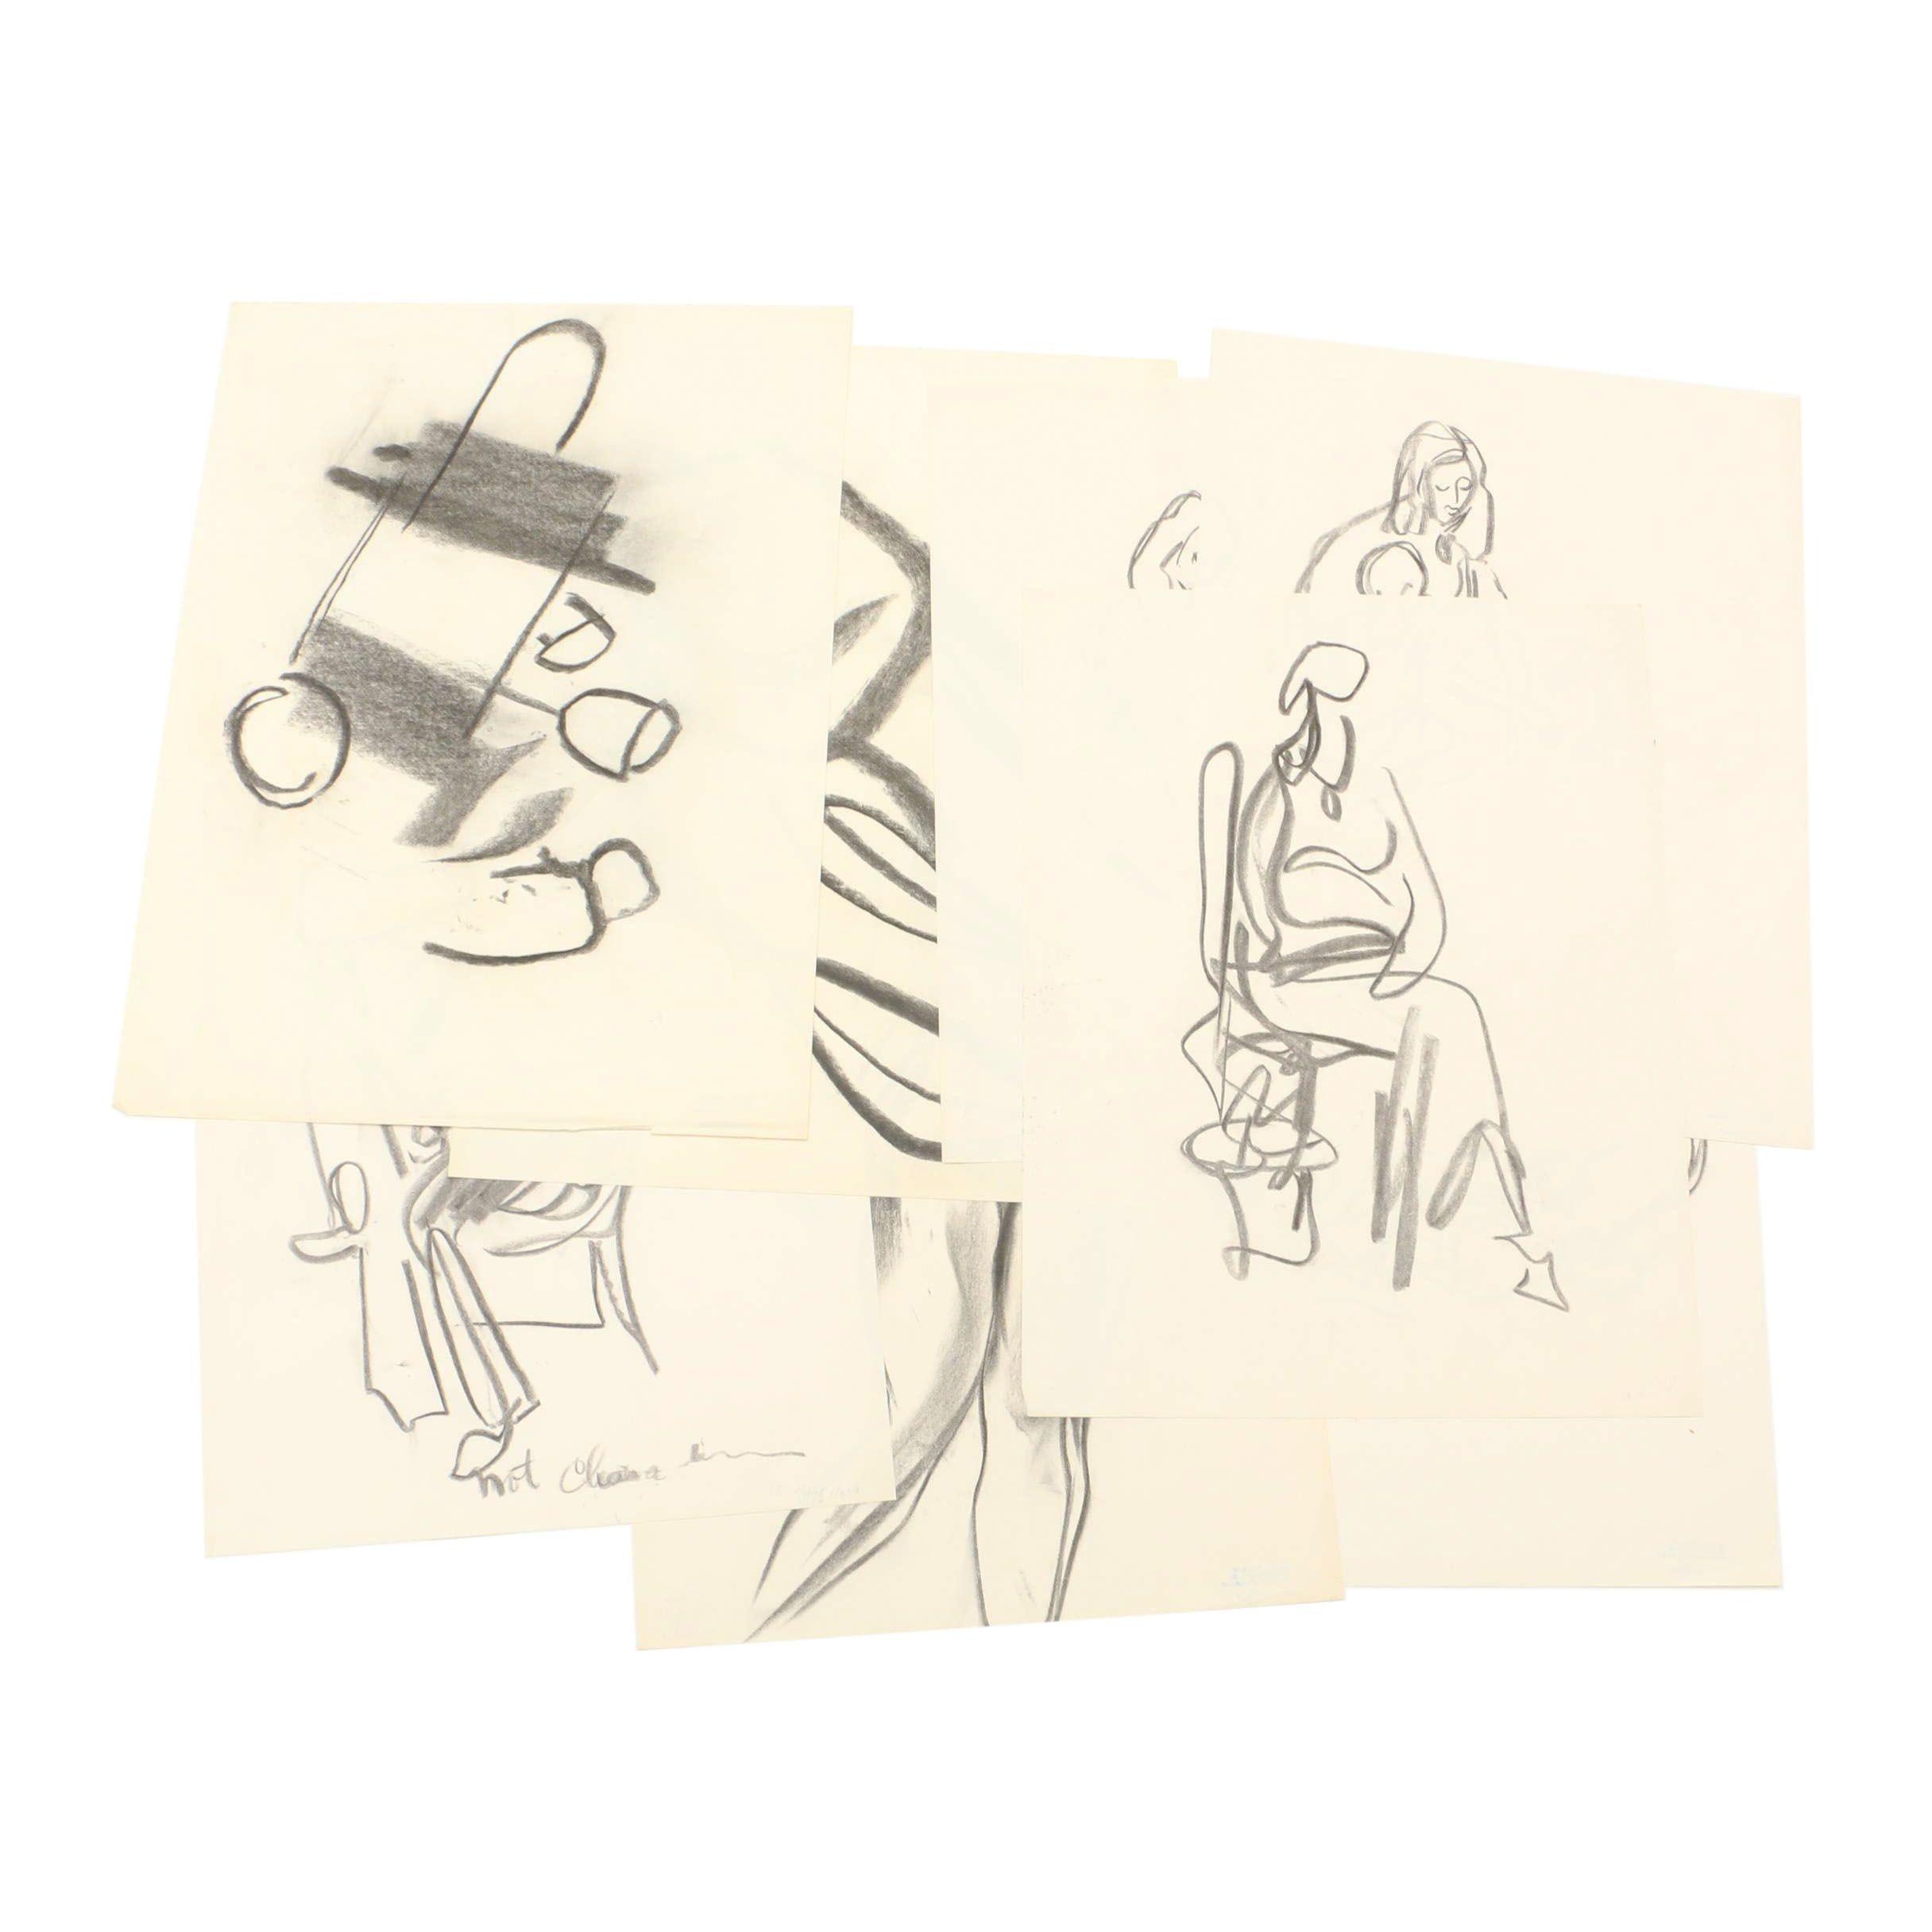 Paul Chidlaw Charcoal Figure Gesture Drawings